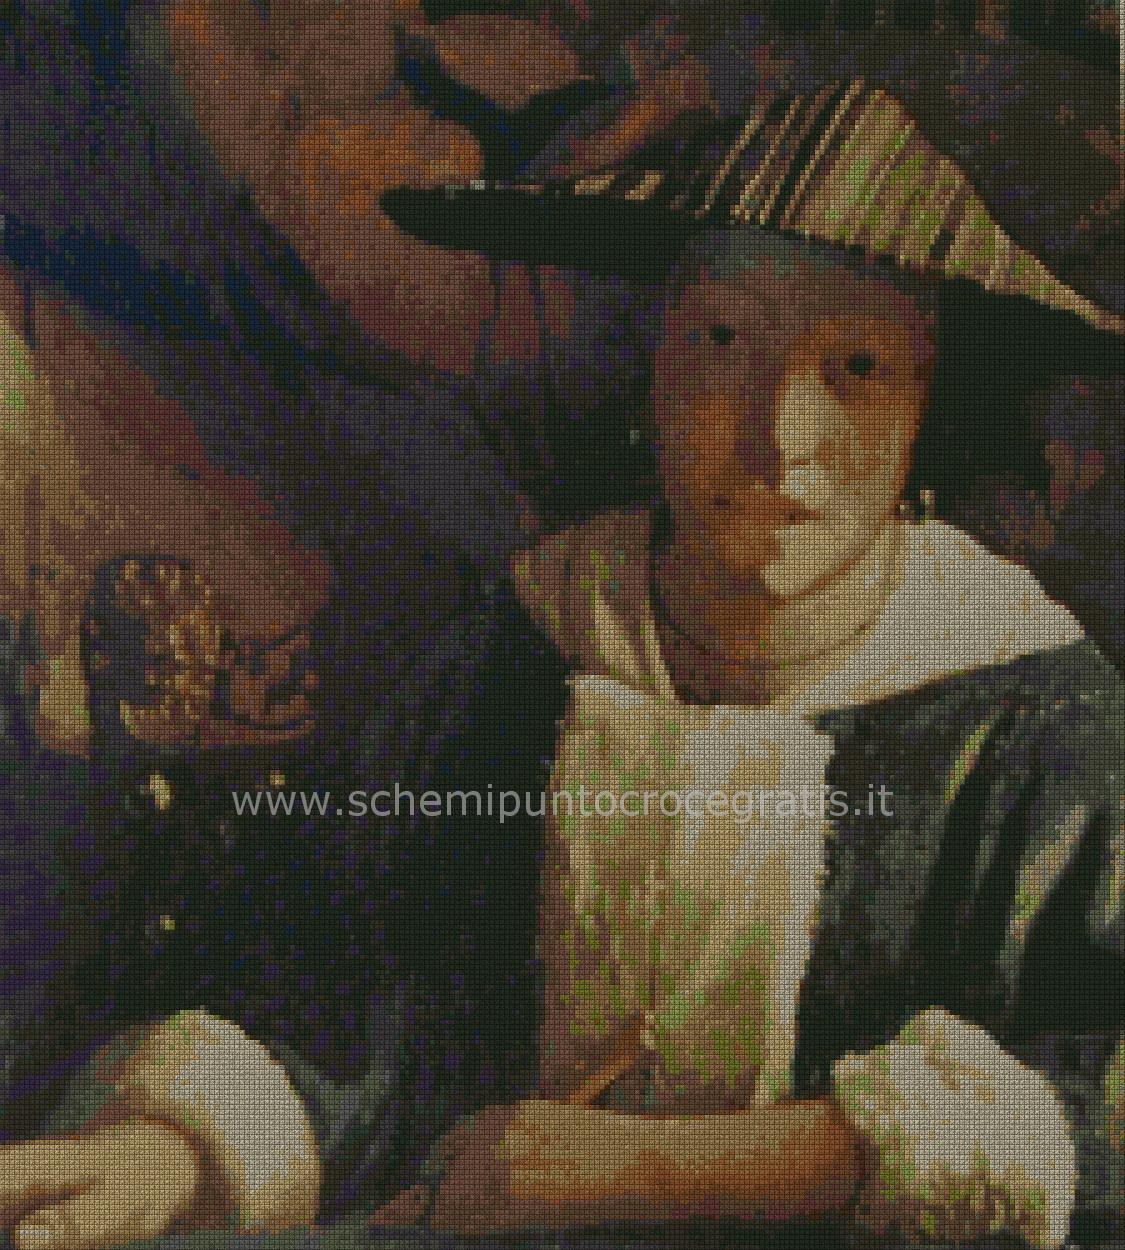 pittori_classici/vermeer/vermeer_03s.jpg